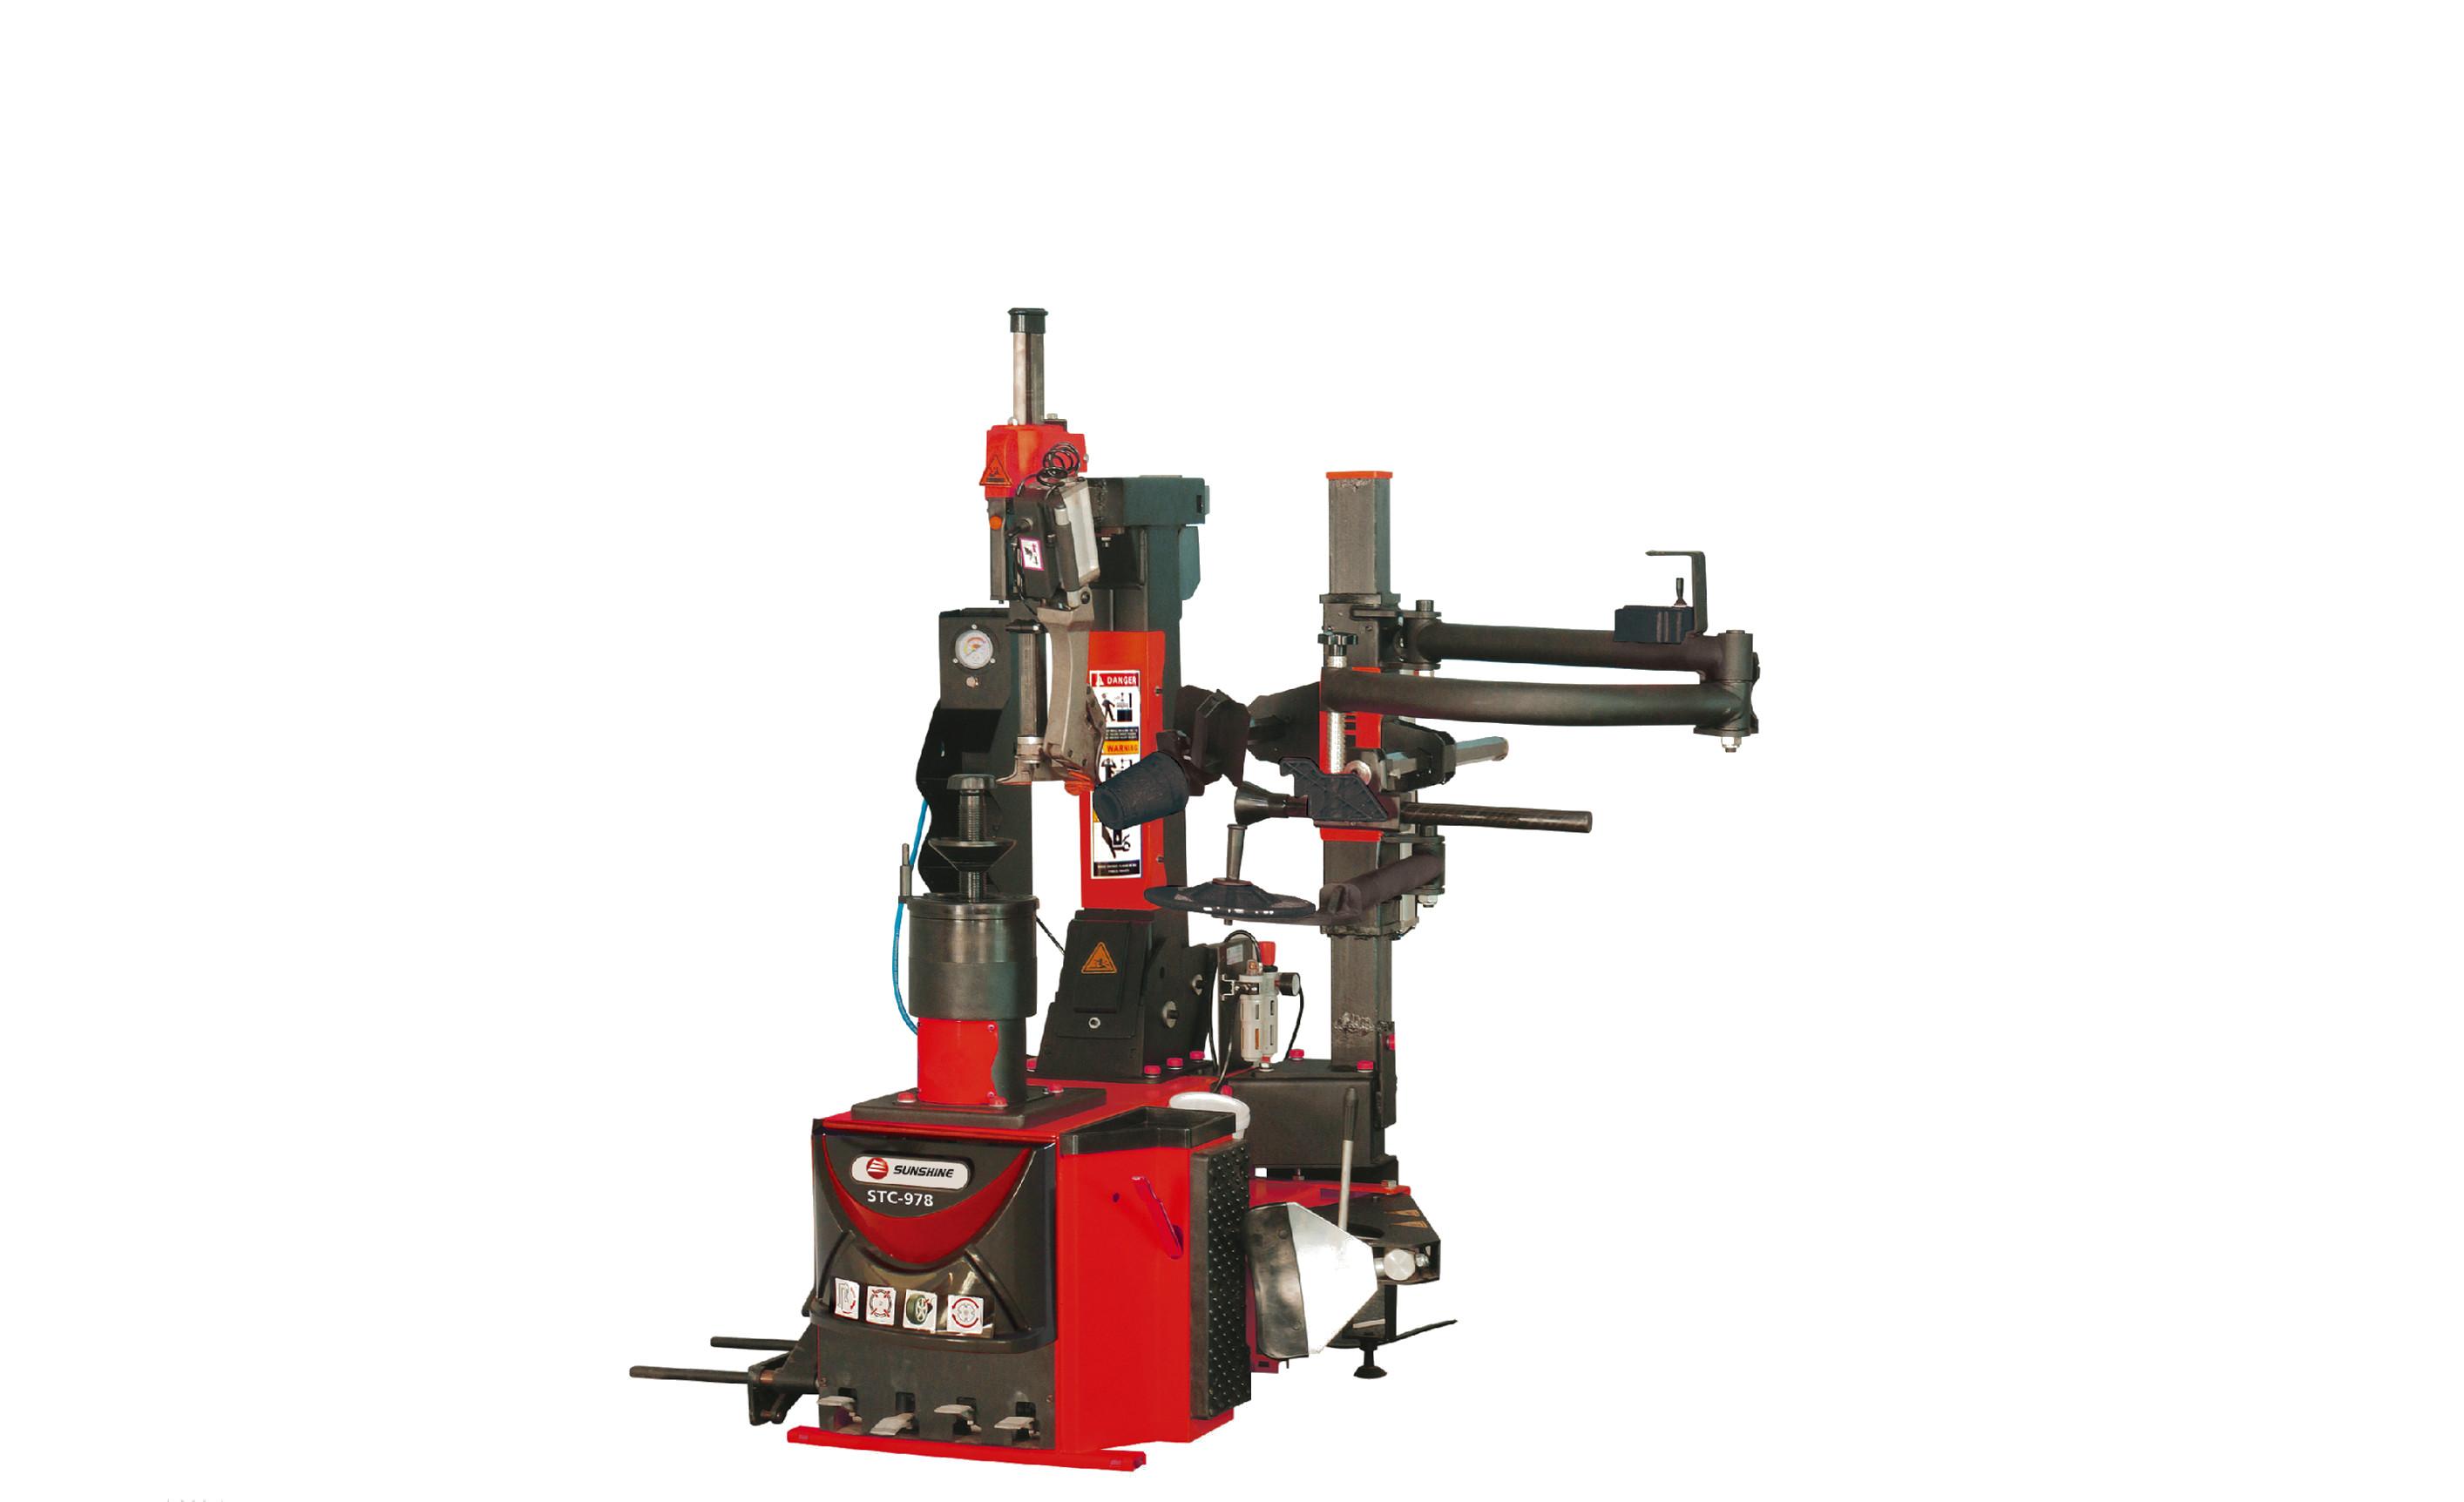 Reifenmontagemaschine STC-978